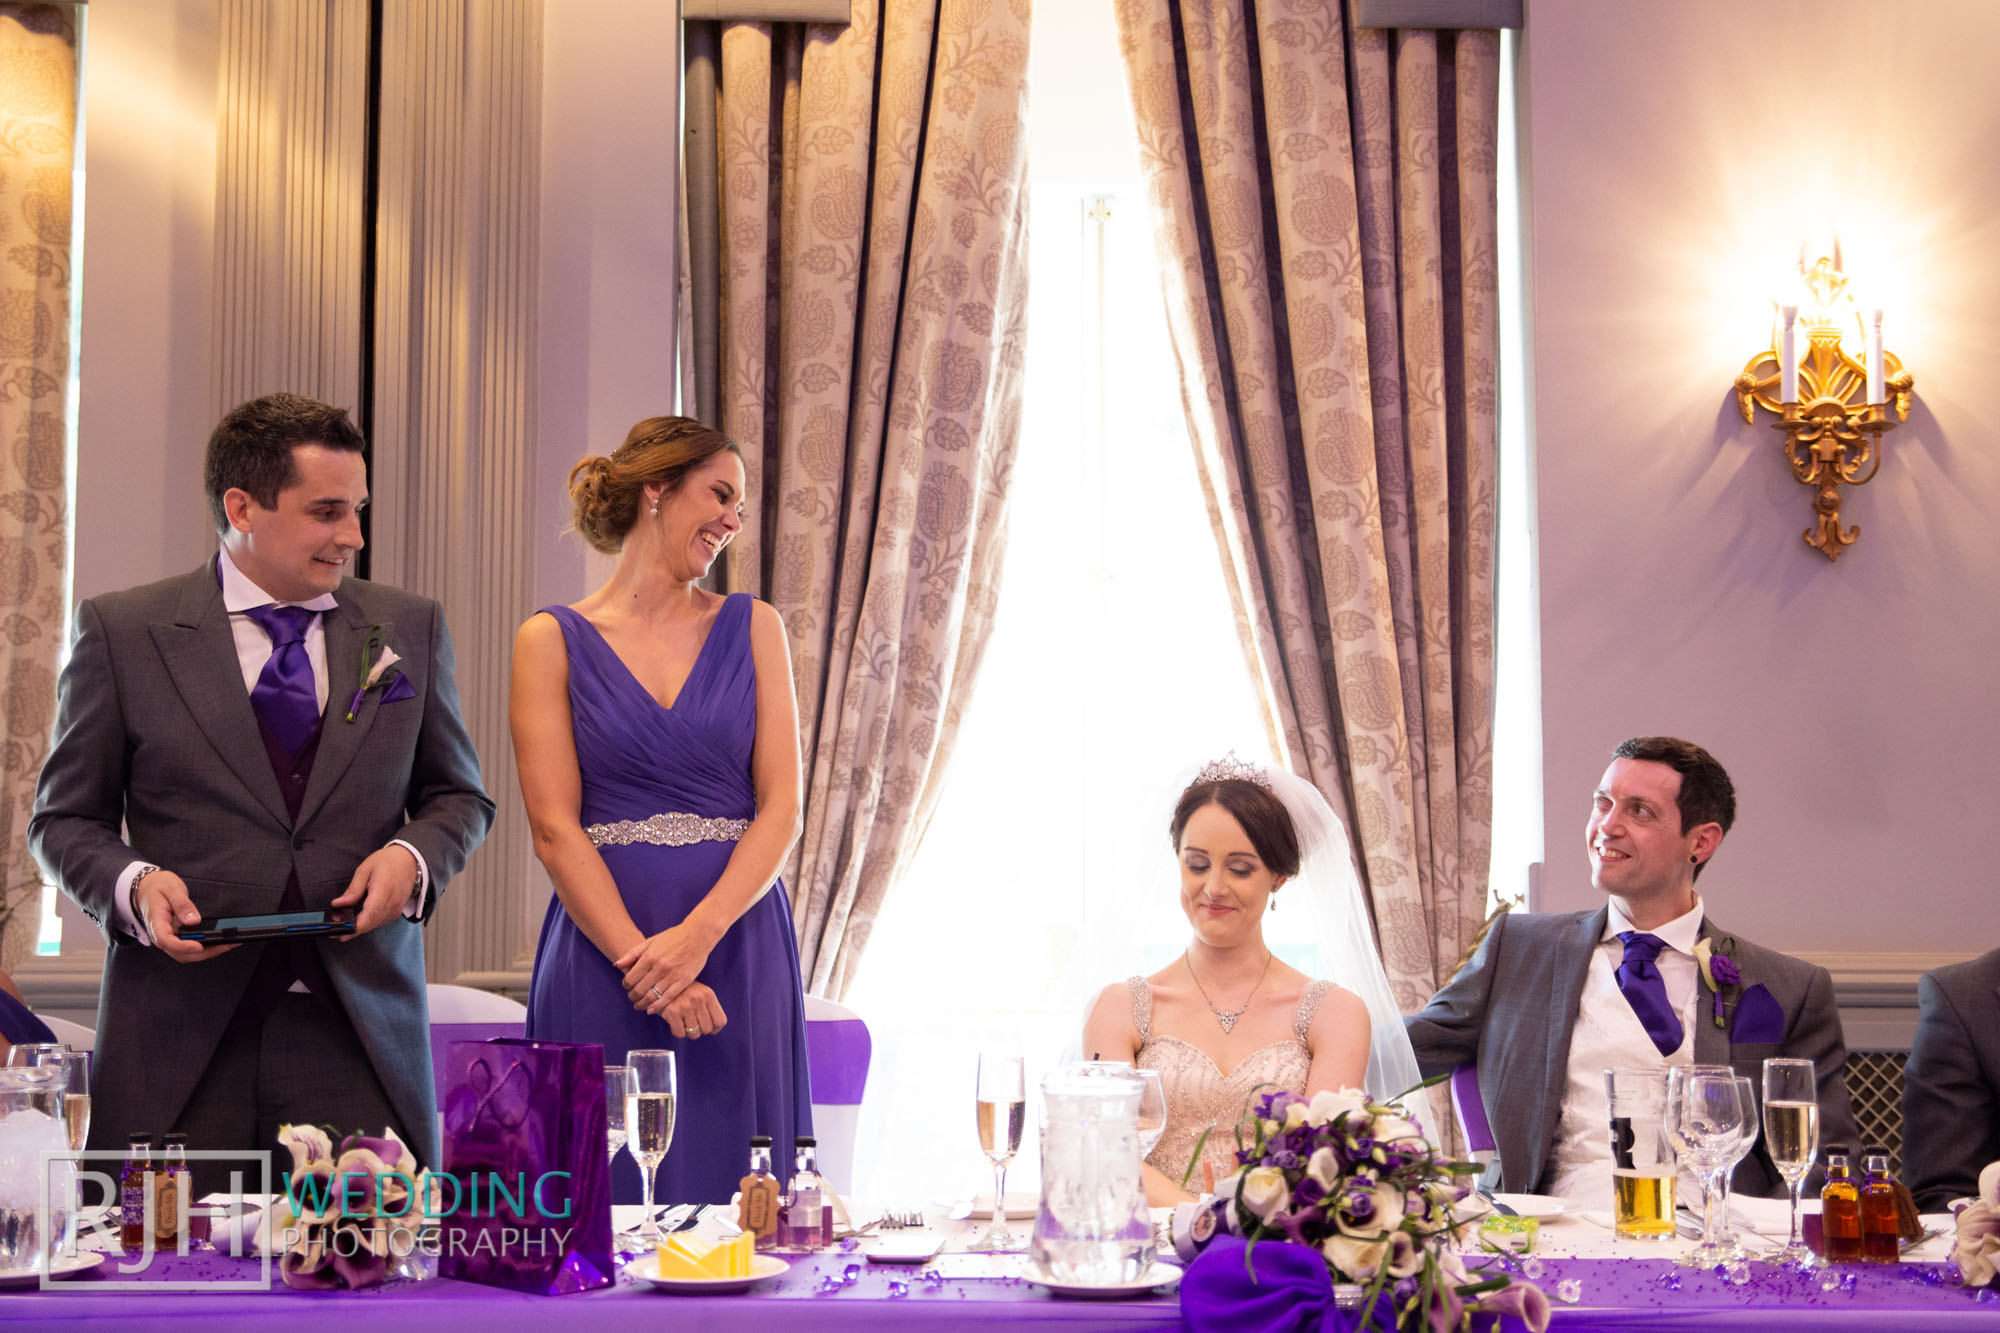 Oulton Hall Wedding Photography_Goodwill-Hall_037_IMG_6788.jpg